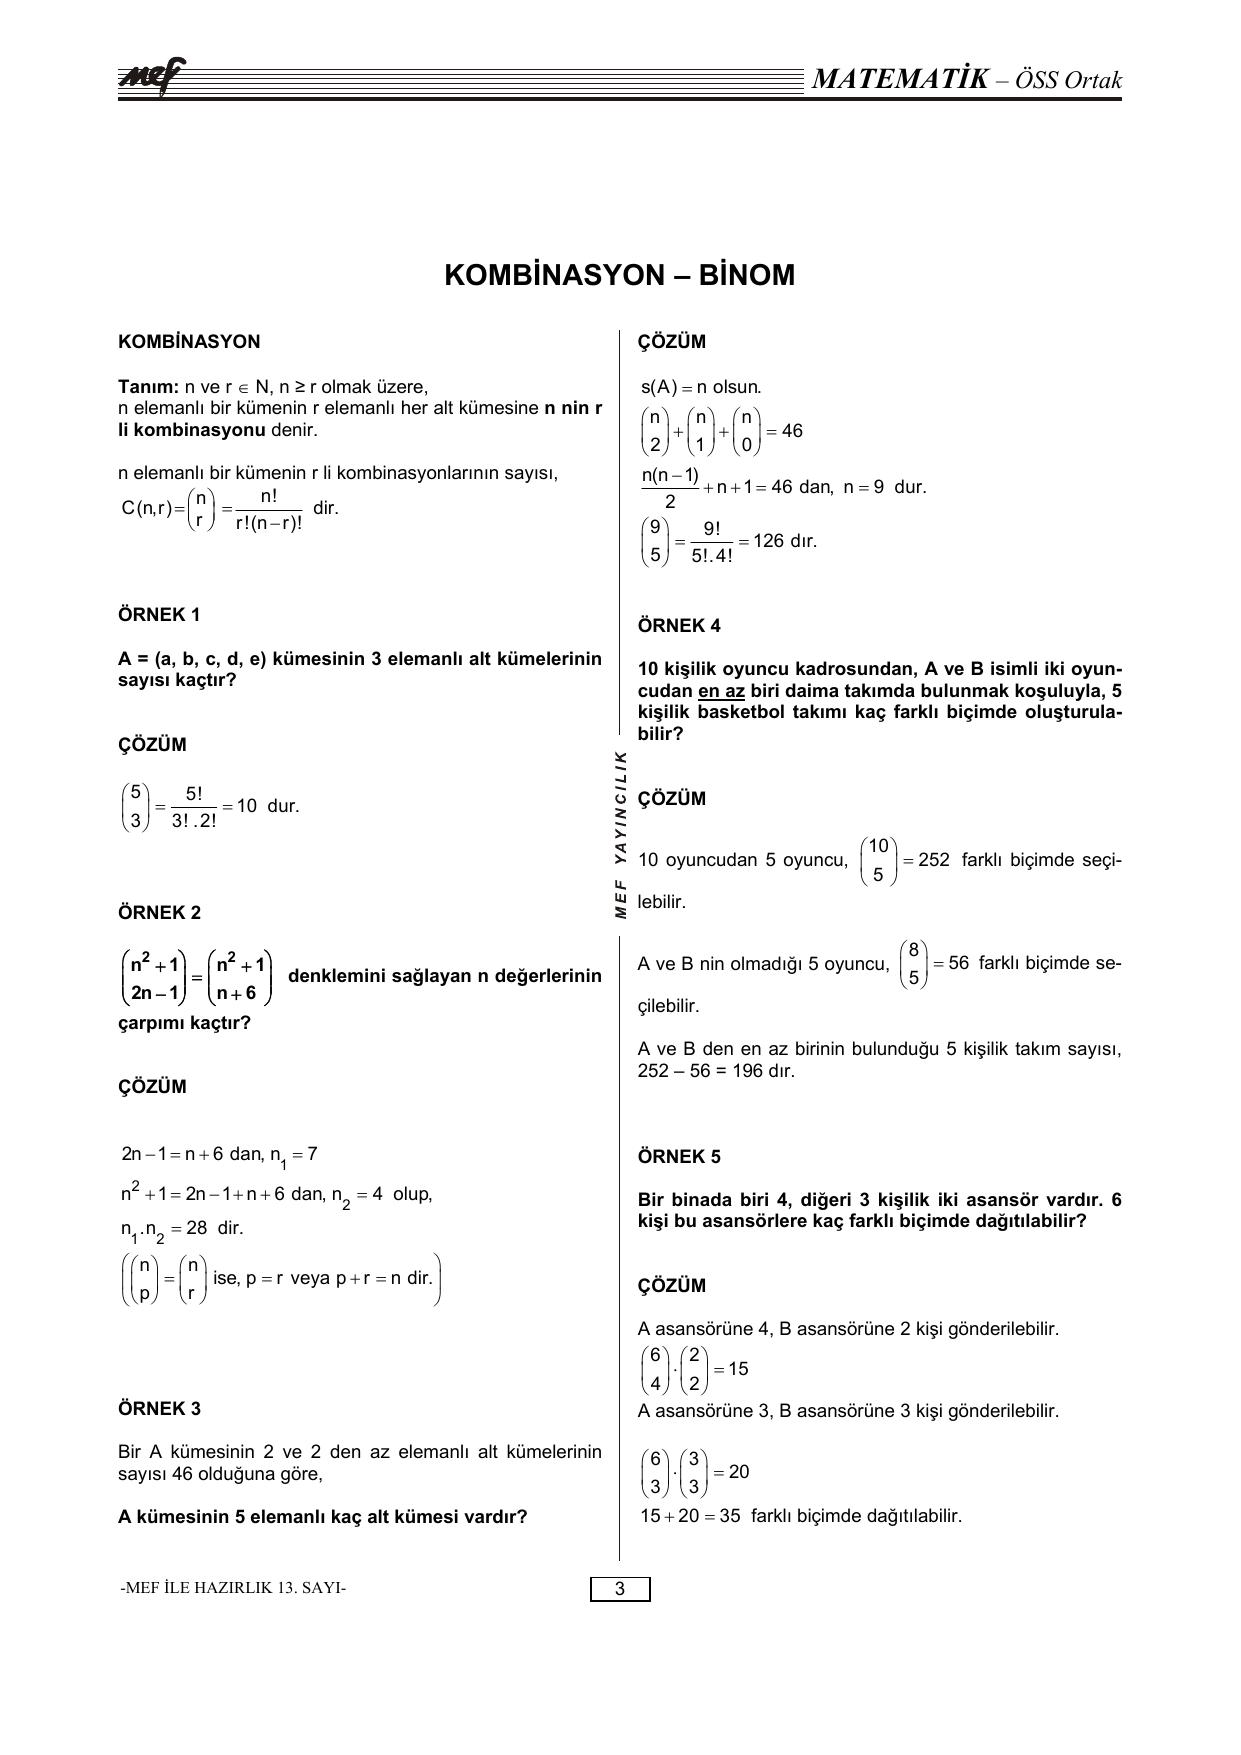 Kombinasyon Binom Bogaziciliden Ozel Matematik Dersi